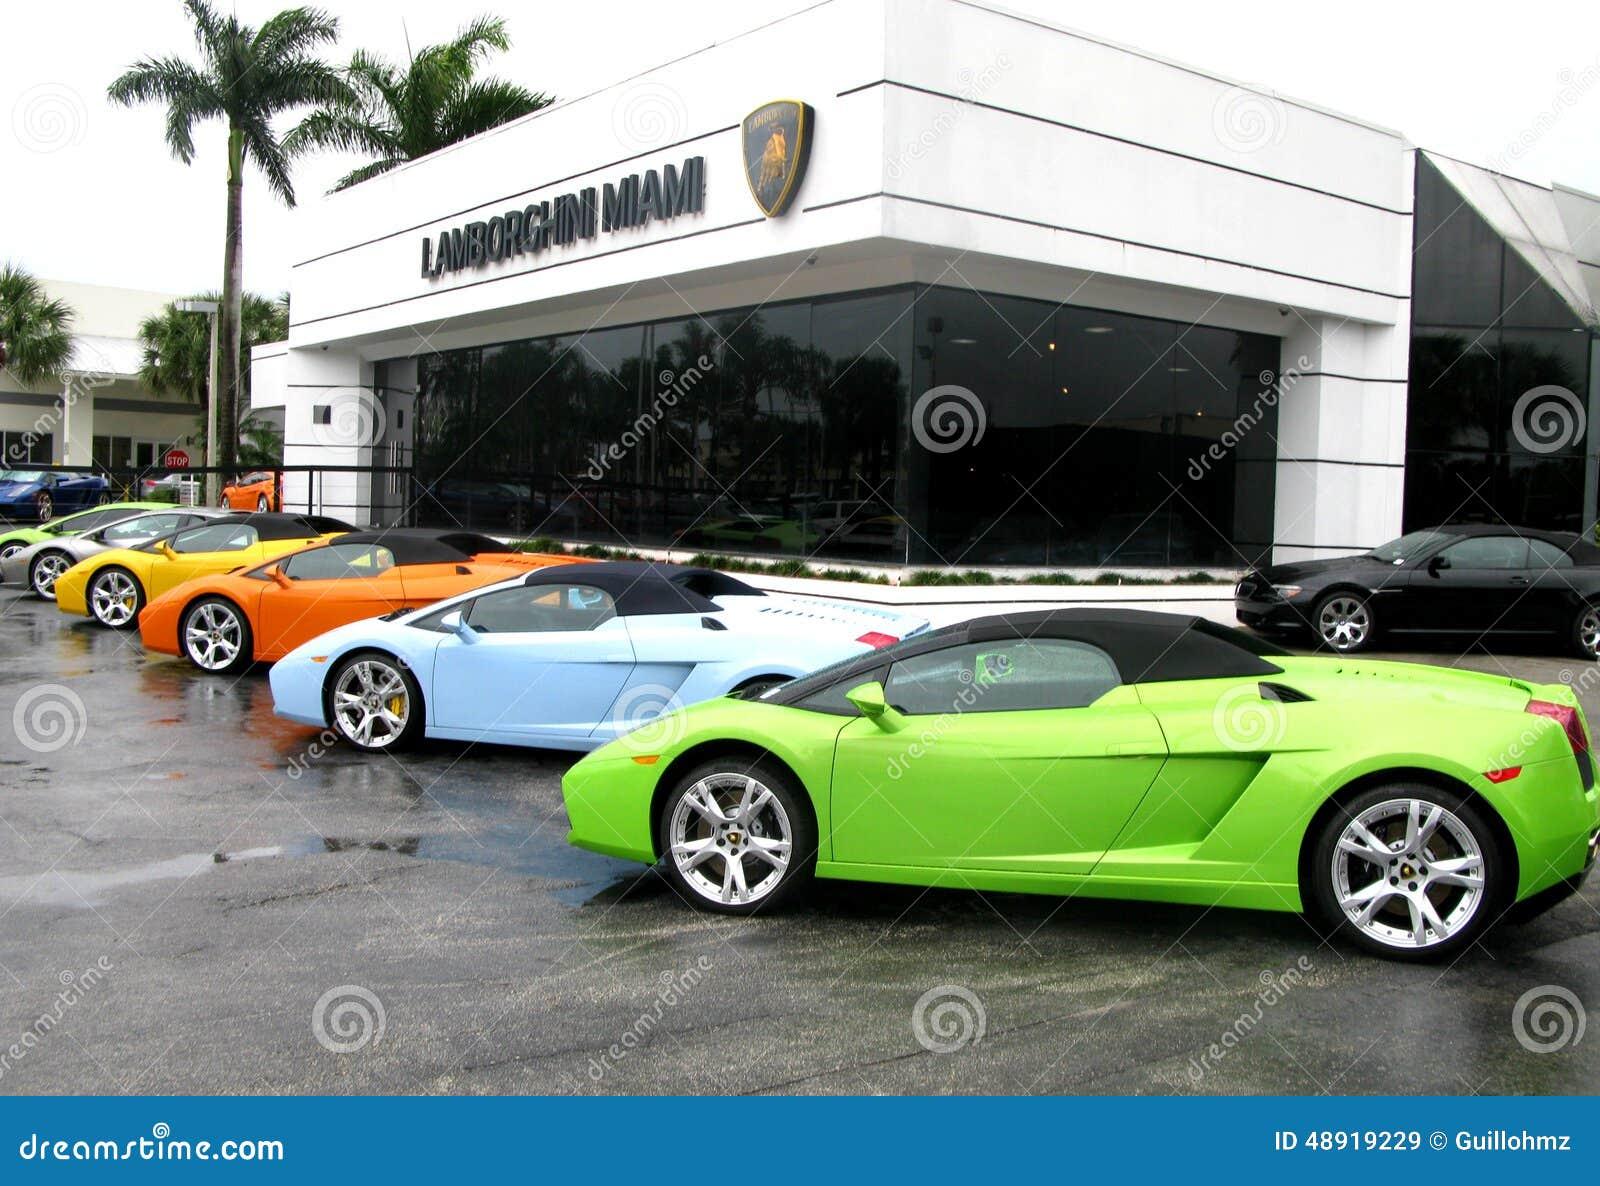 Editorial Stock Image Lamborghini Store Miami Sport Car Florida Usa Image48919229 on Z Ocean El Miami